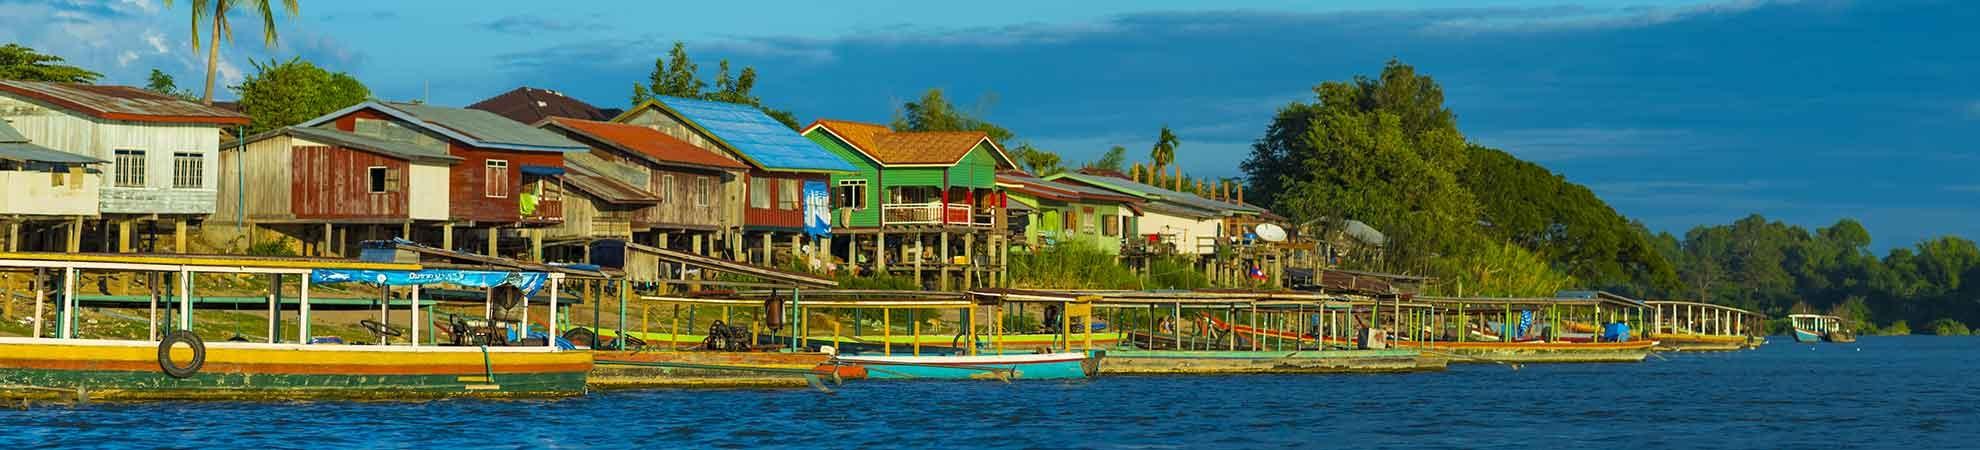 Voyage Ile de Khong